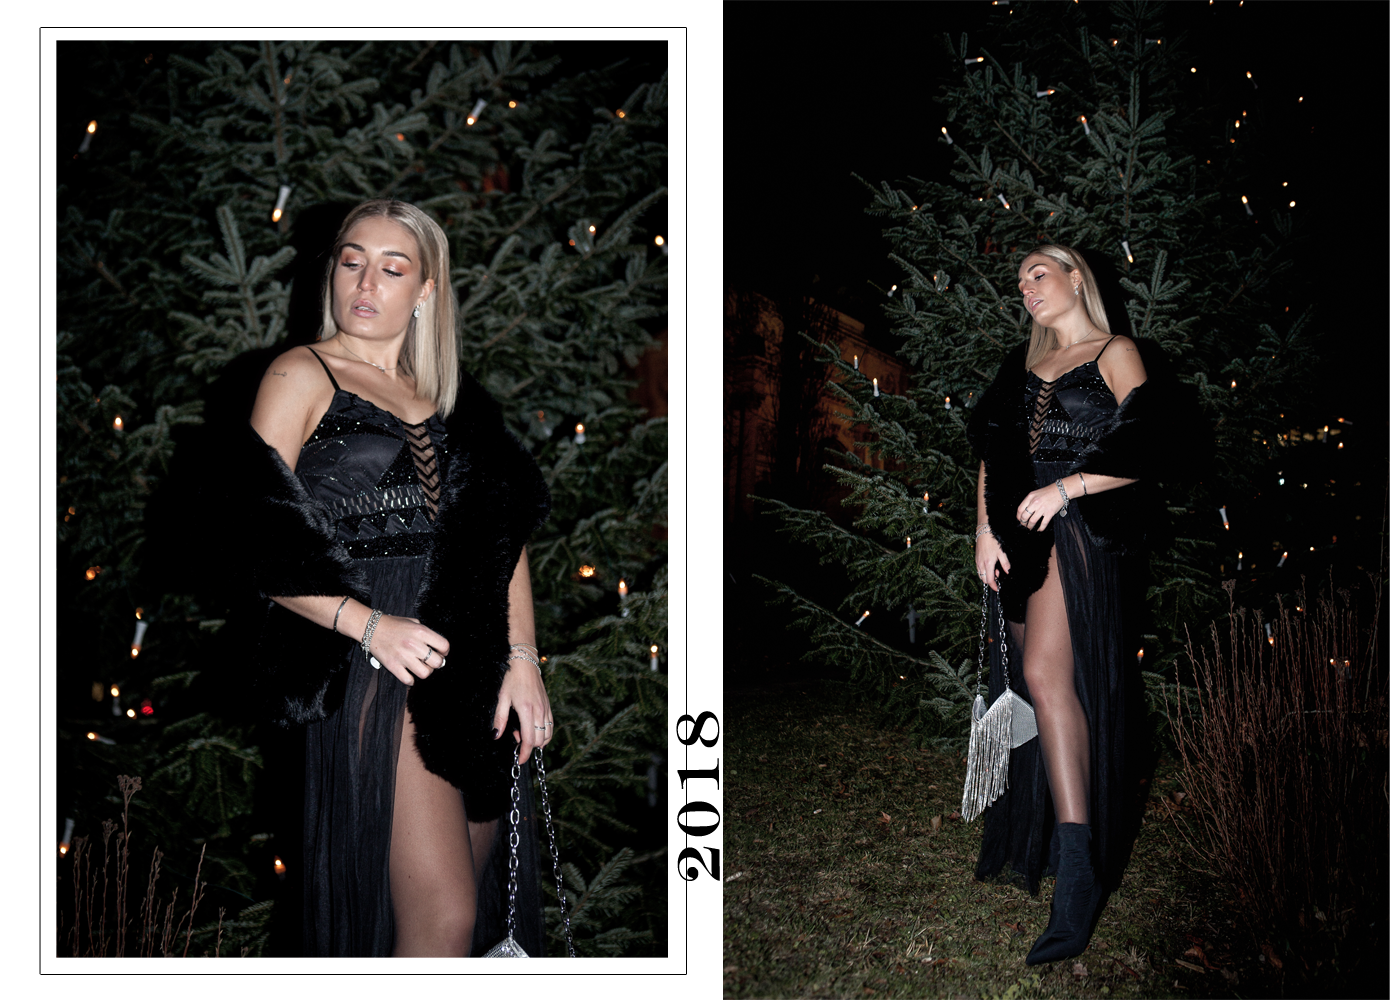 Lauralamode Jahresrückblick 2018 New Year Silvester Outfit Ivy Revel Asos Look Silvester Look Silvester Outfit New Years Eve Look Inspo Berlin Munich Muenchen Fashionblogger Blogger6